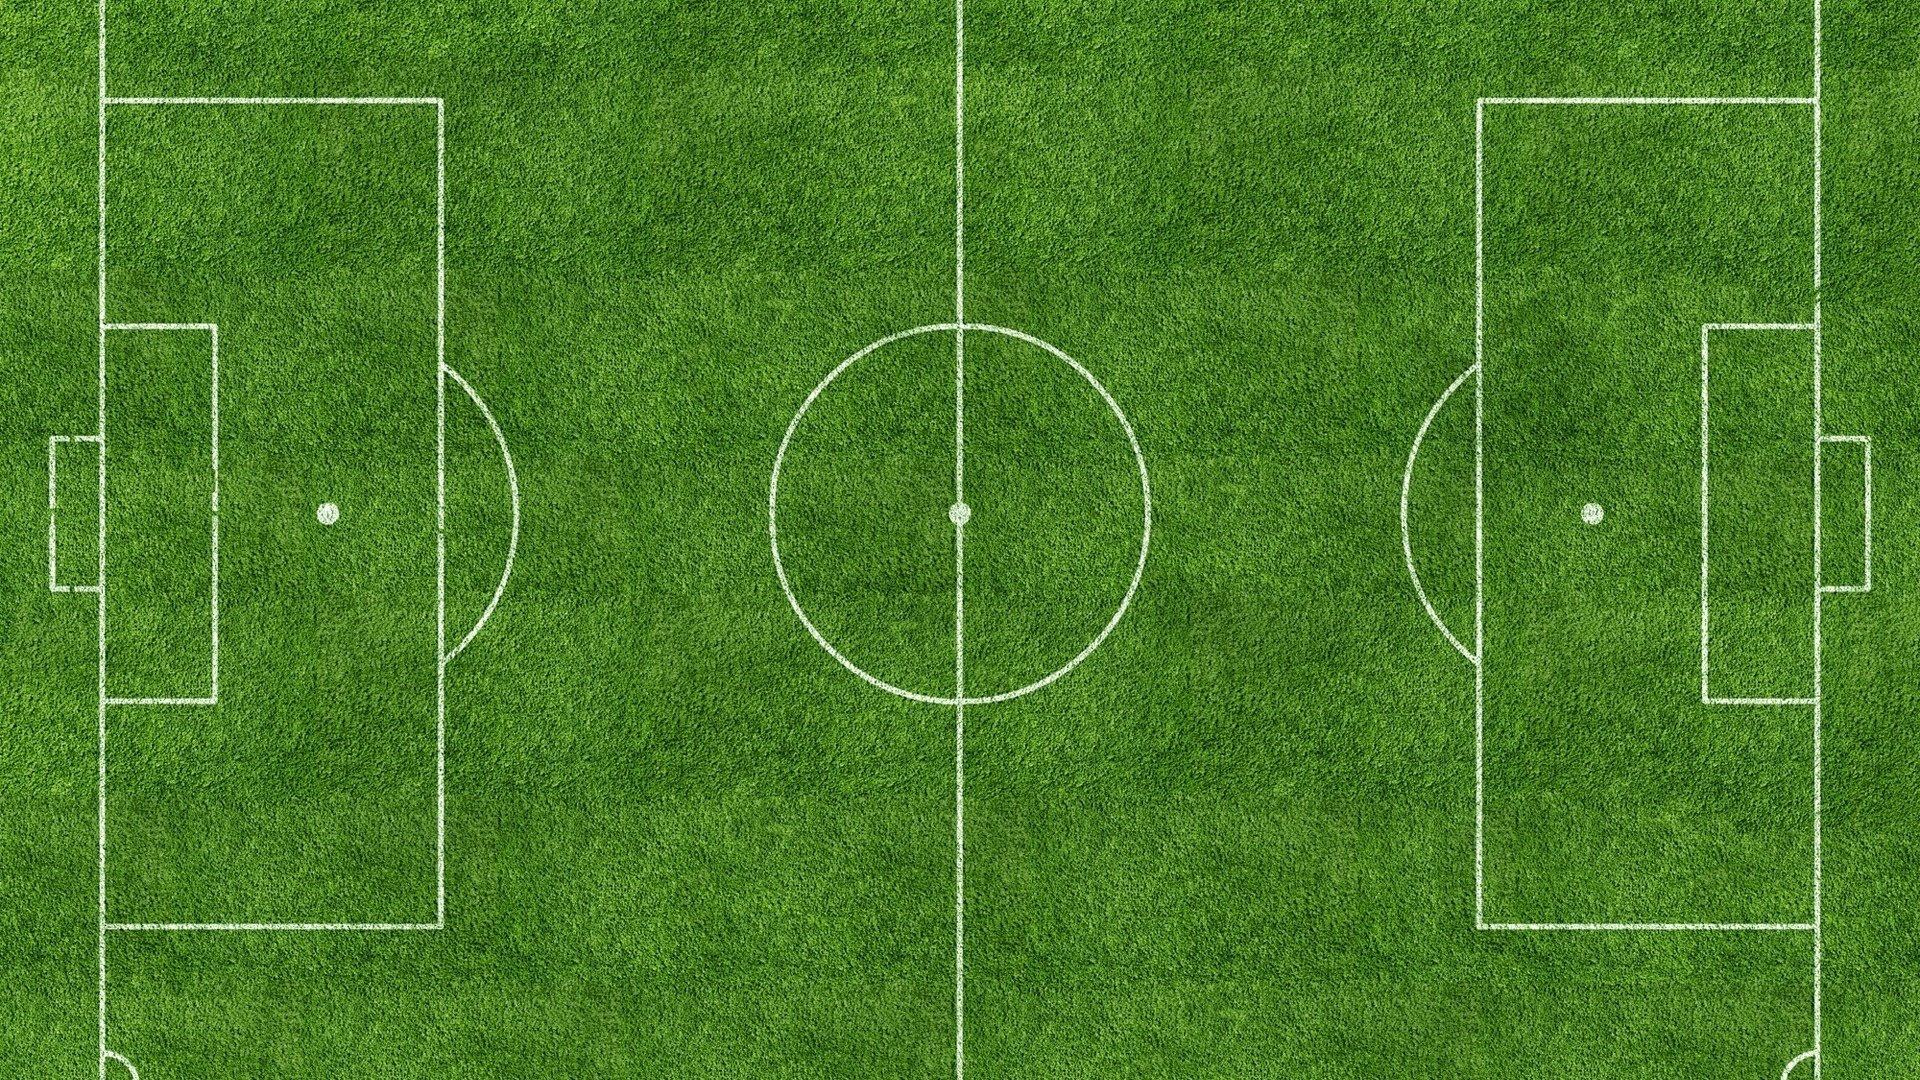 calcio hd wallpapers - photo #23